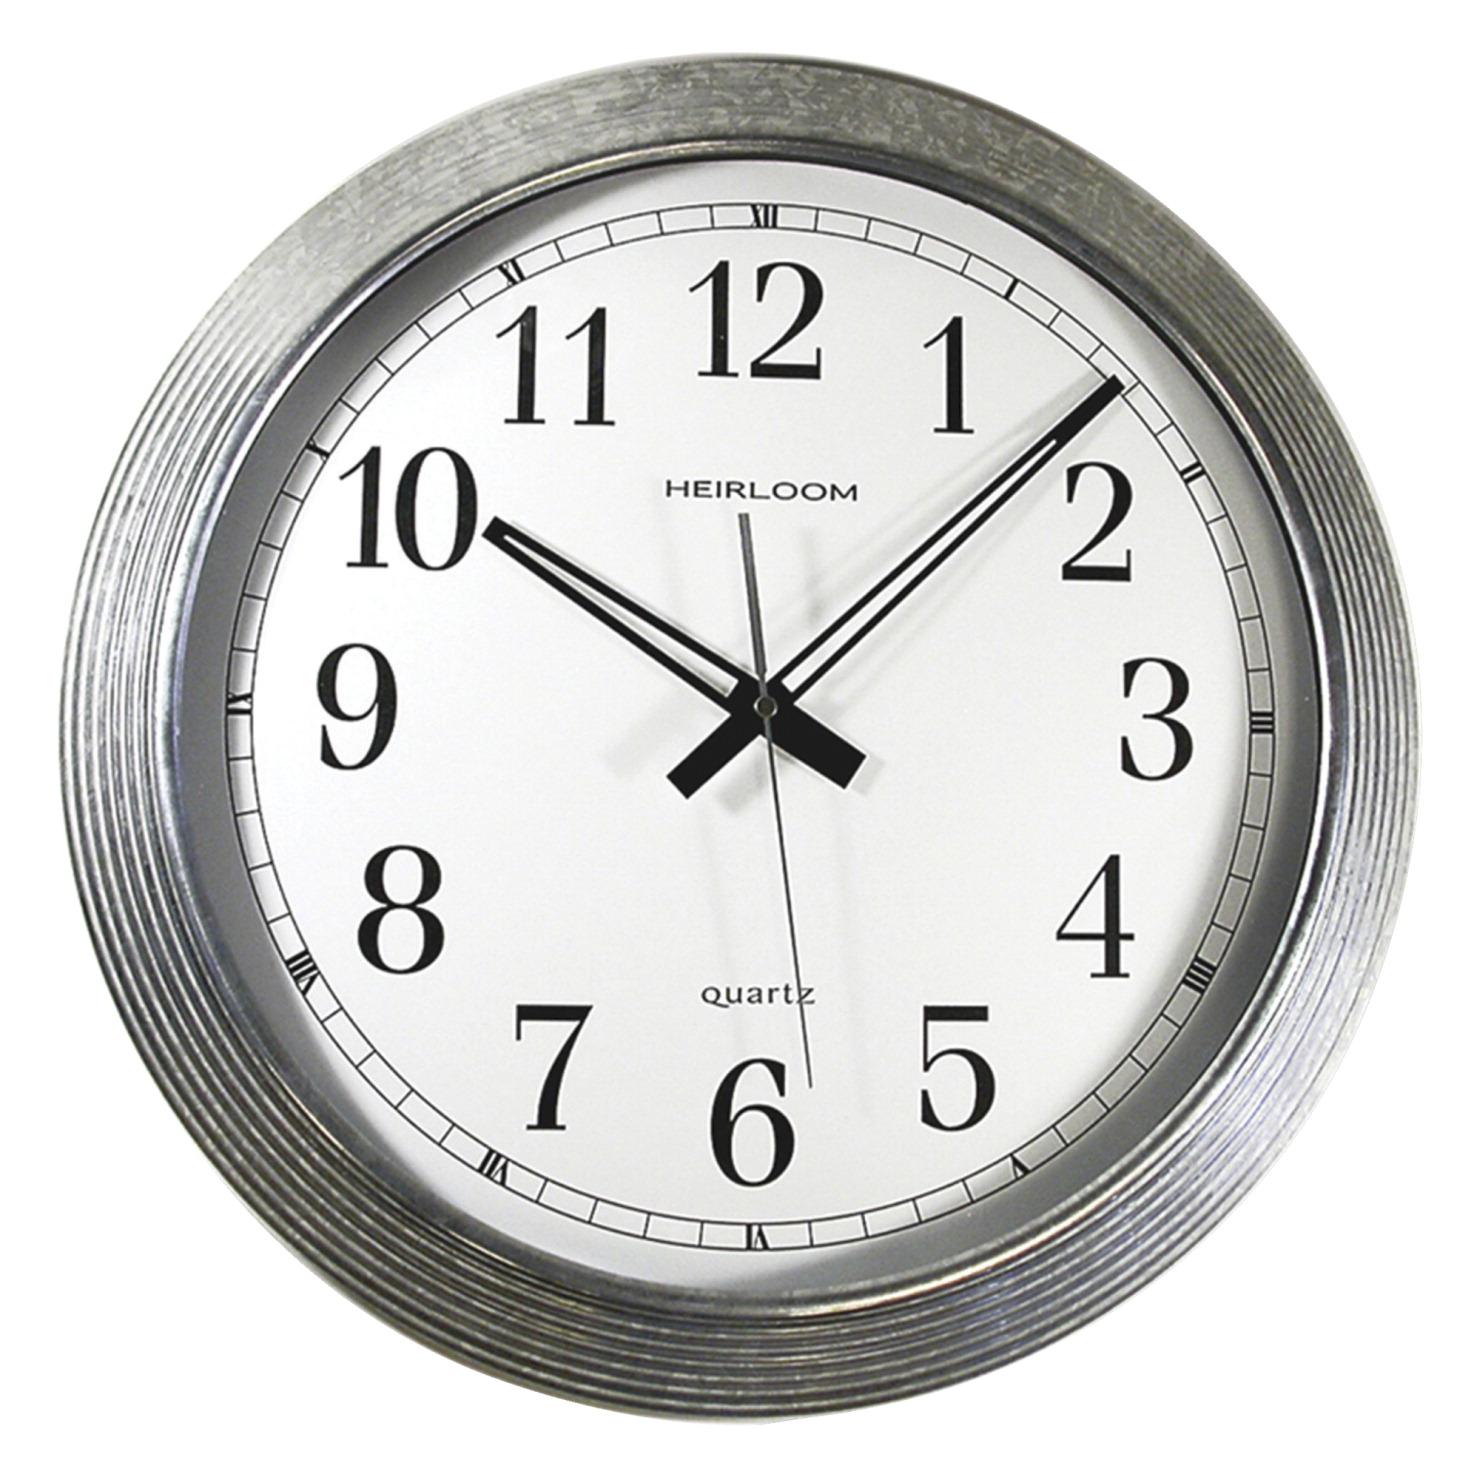 Wall Clock - SOAR Life Products